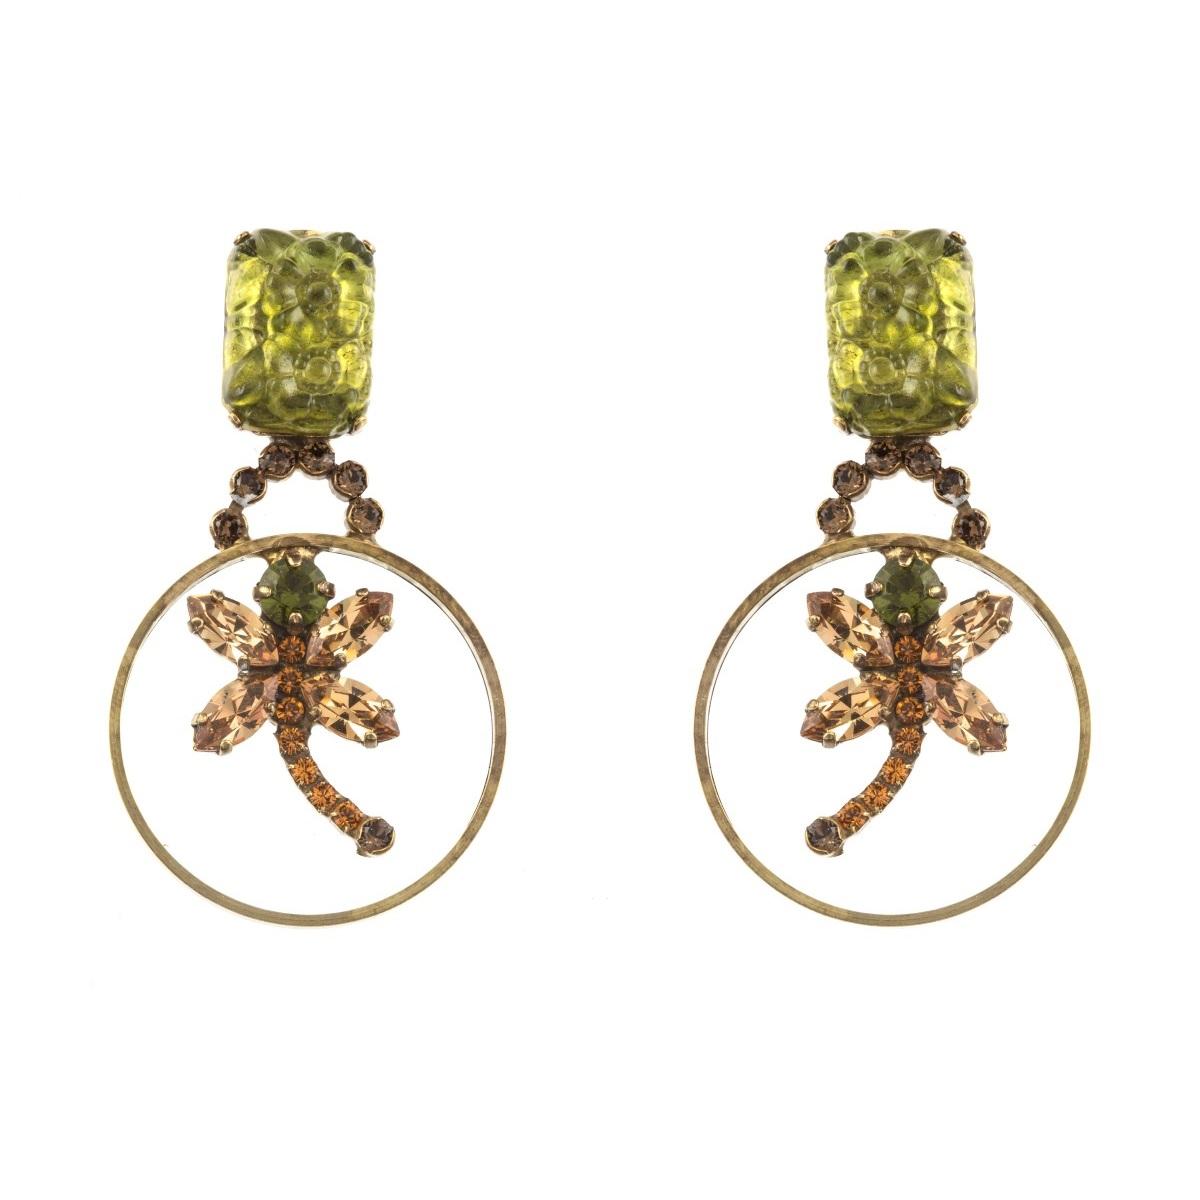 ARTWEAR DIMITRIADIS - Γυναικεία κρεμαστά σκουλαρίκια με κρίκο και στρας γυναικεία αξεσουάρ κοσμήματα σκουλαρίκια